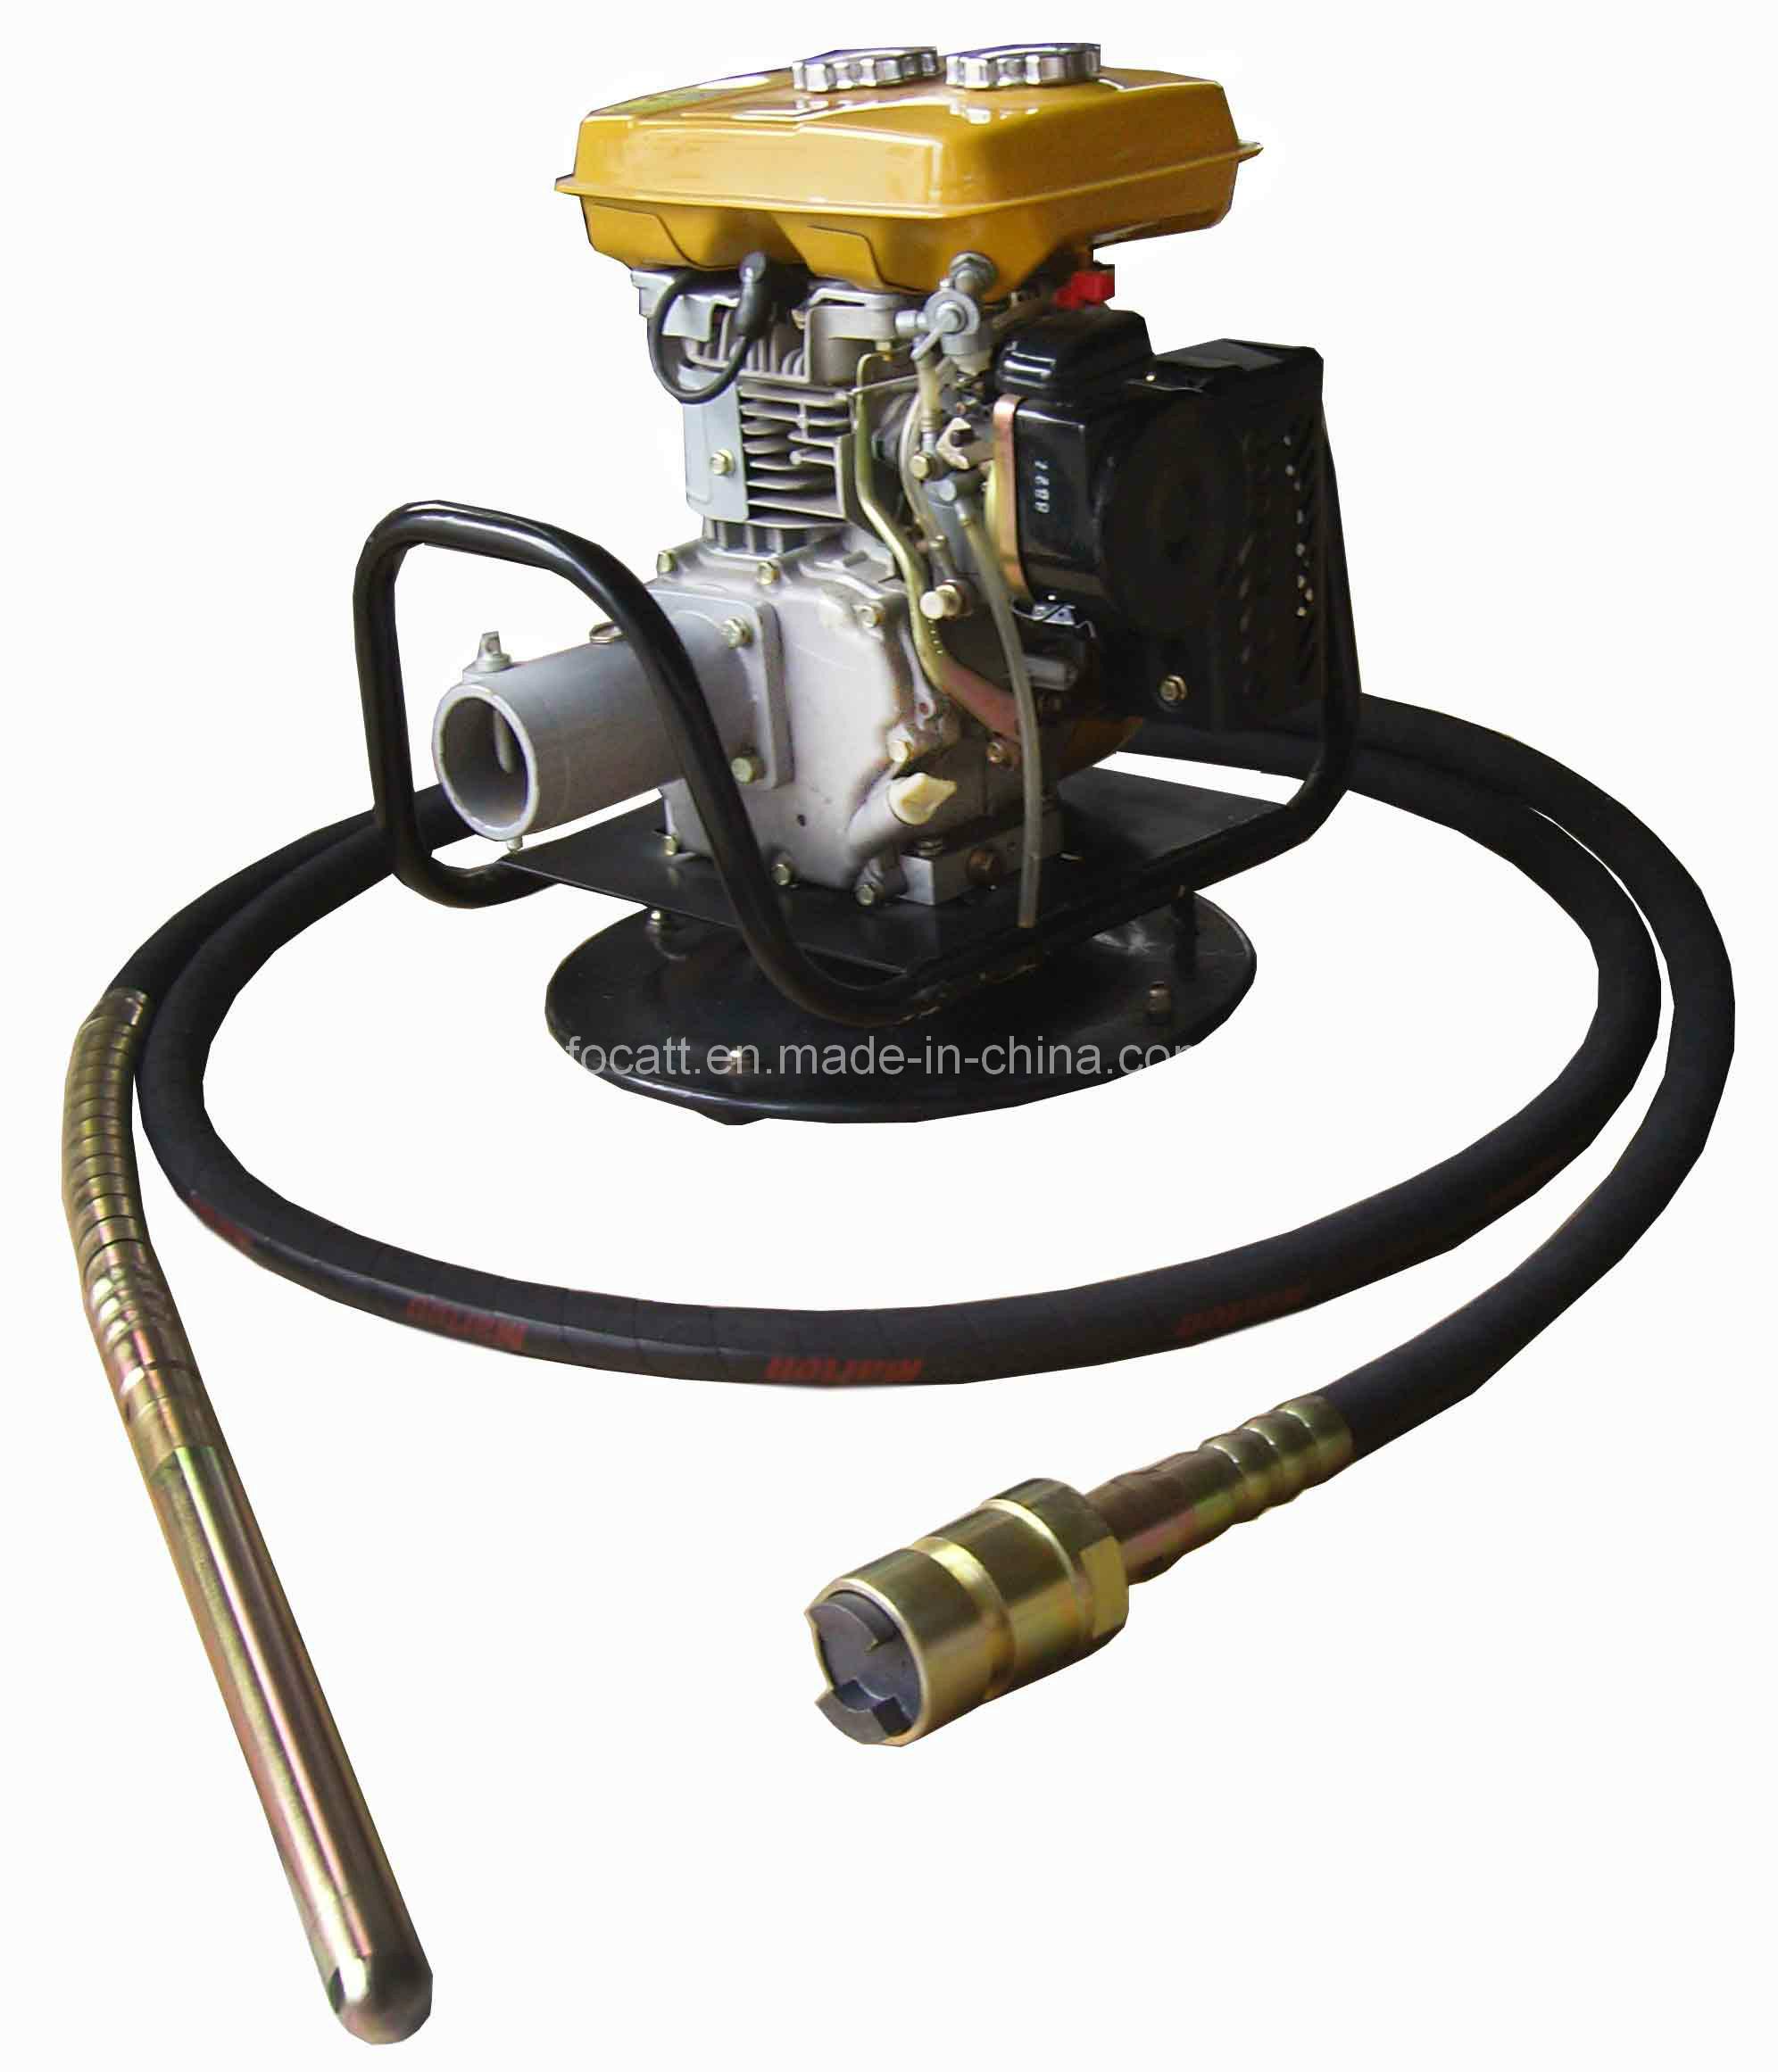 Concrete Vibrator, Petrol Type